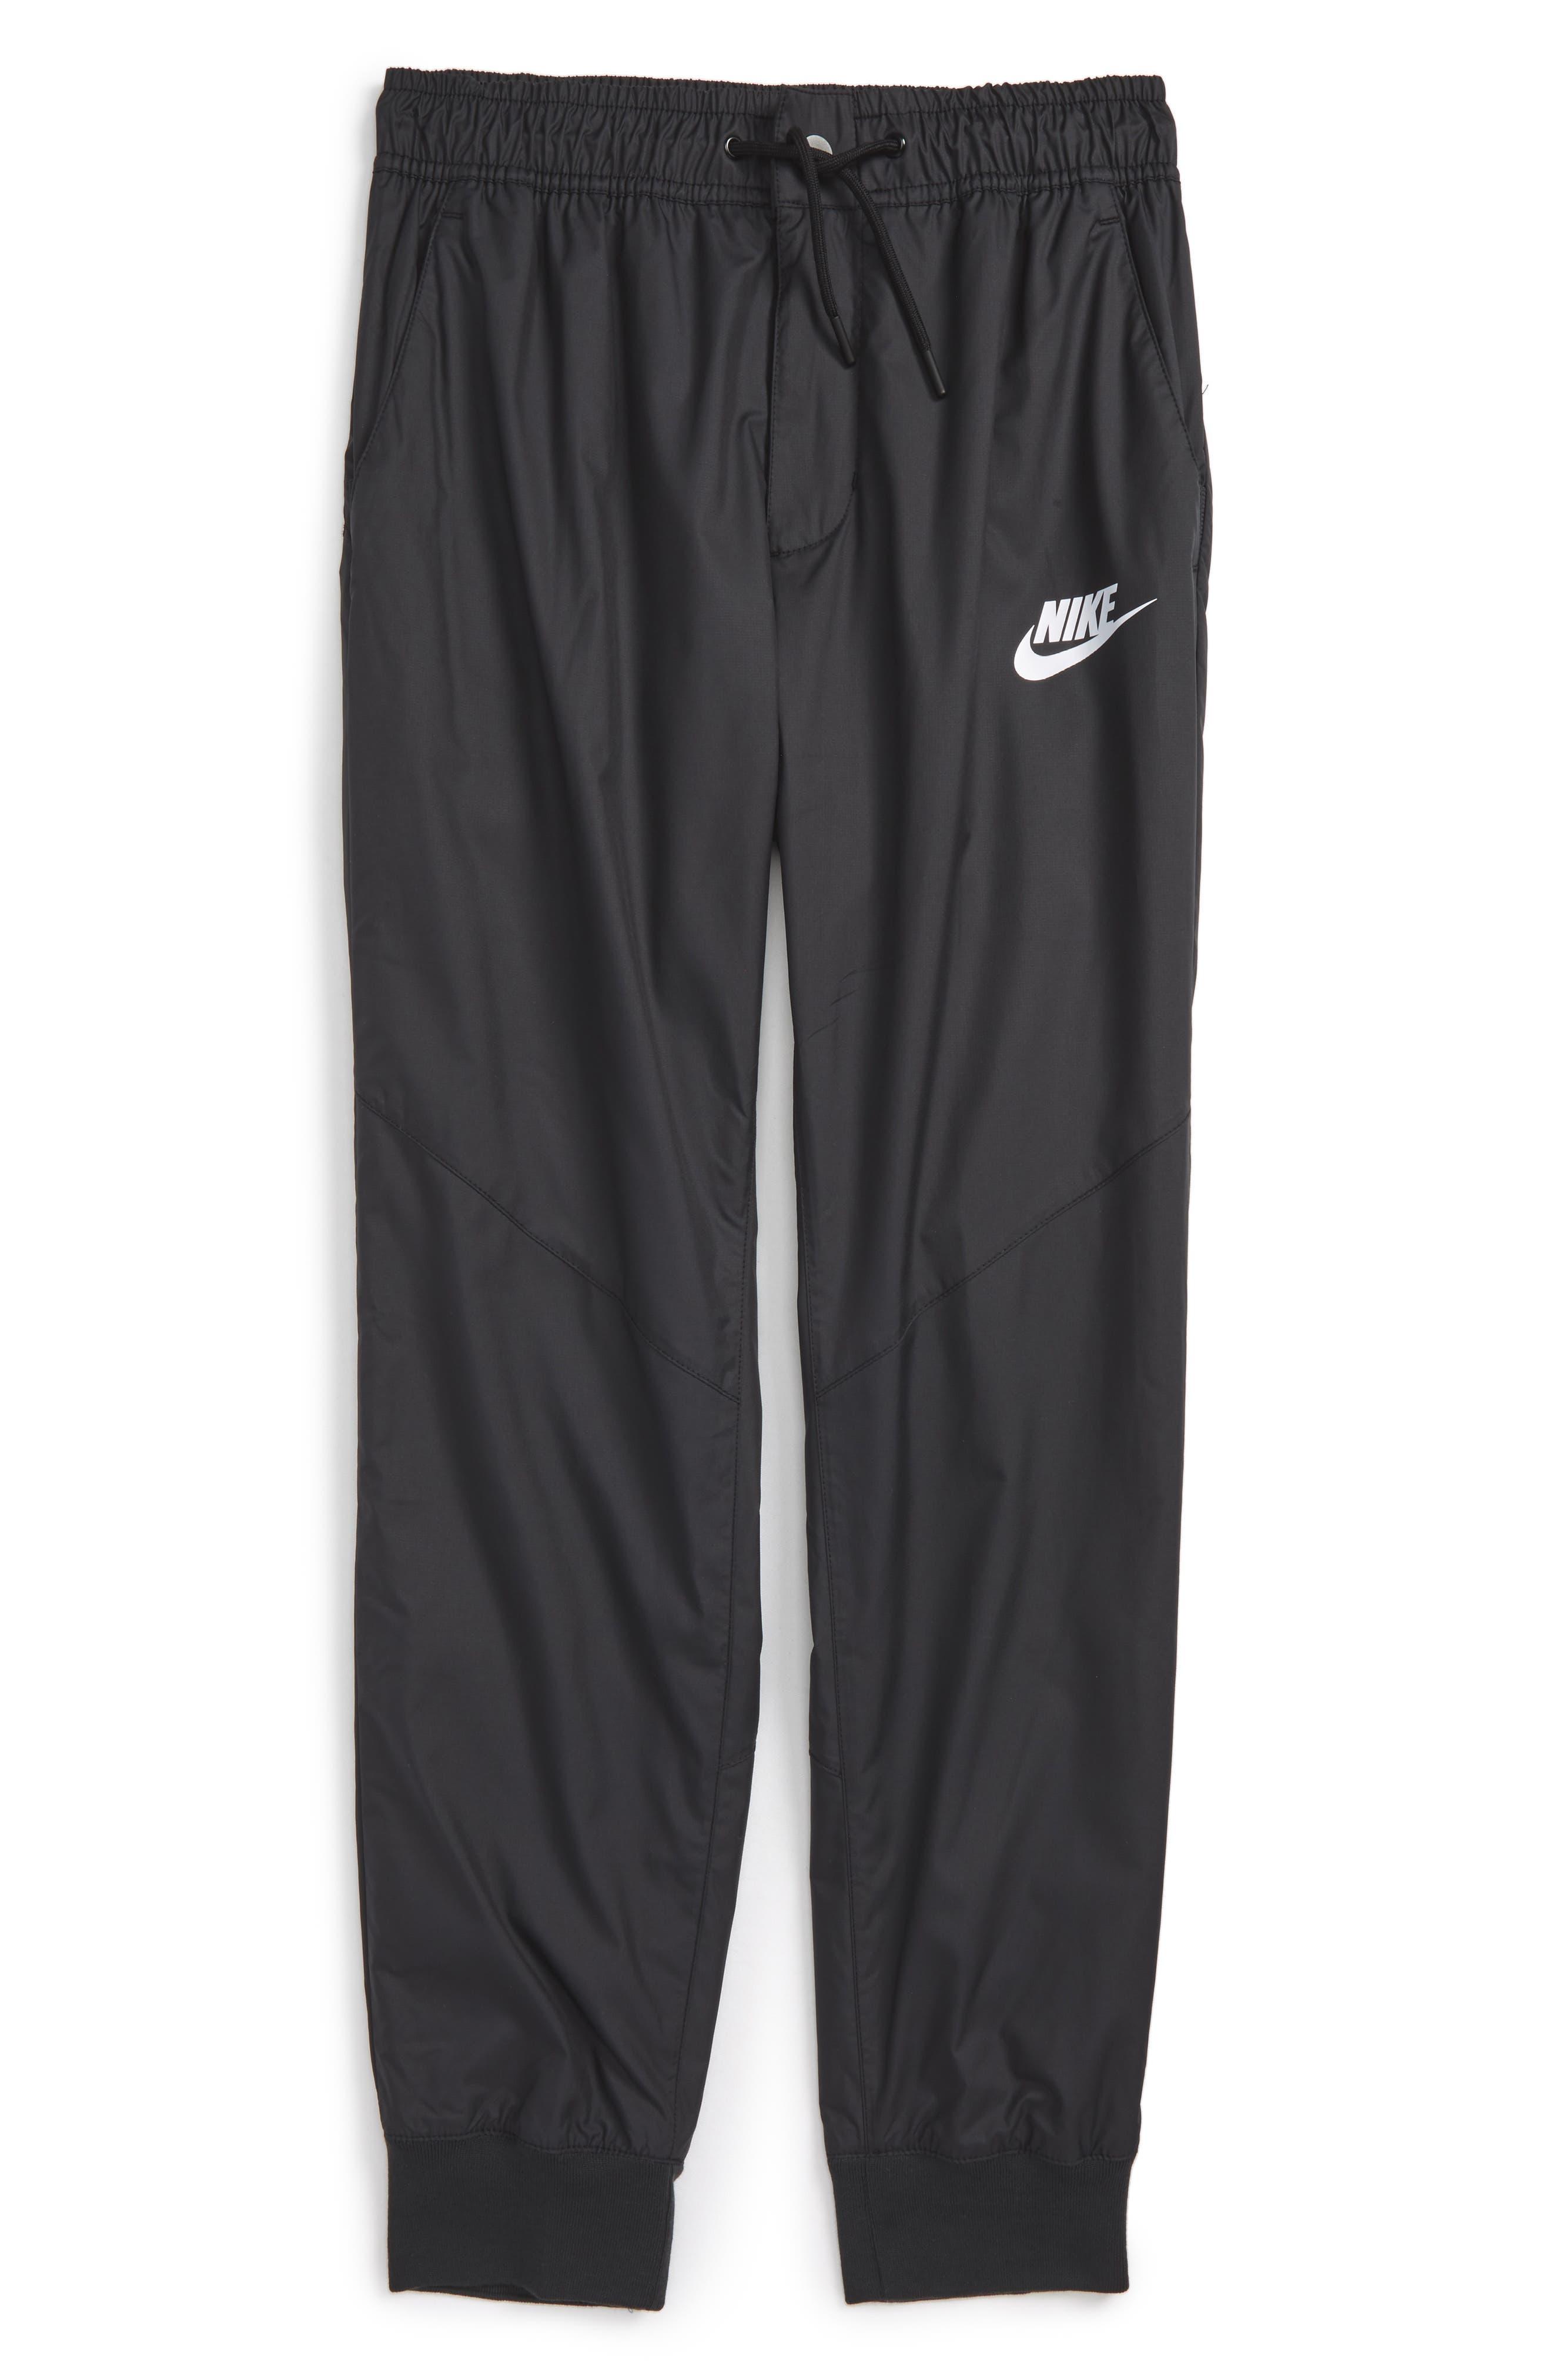 Alternate Image 1 Selected - Nike Sportswear Water Resistant Pants (Little Boys & Big Boys)